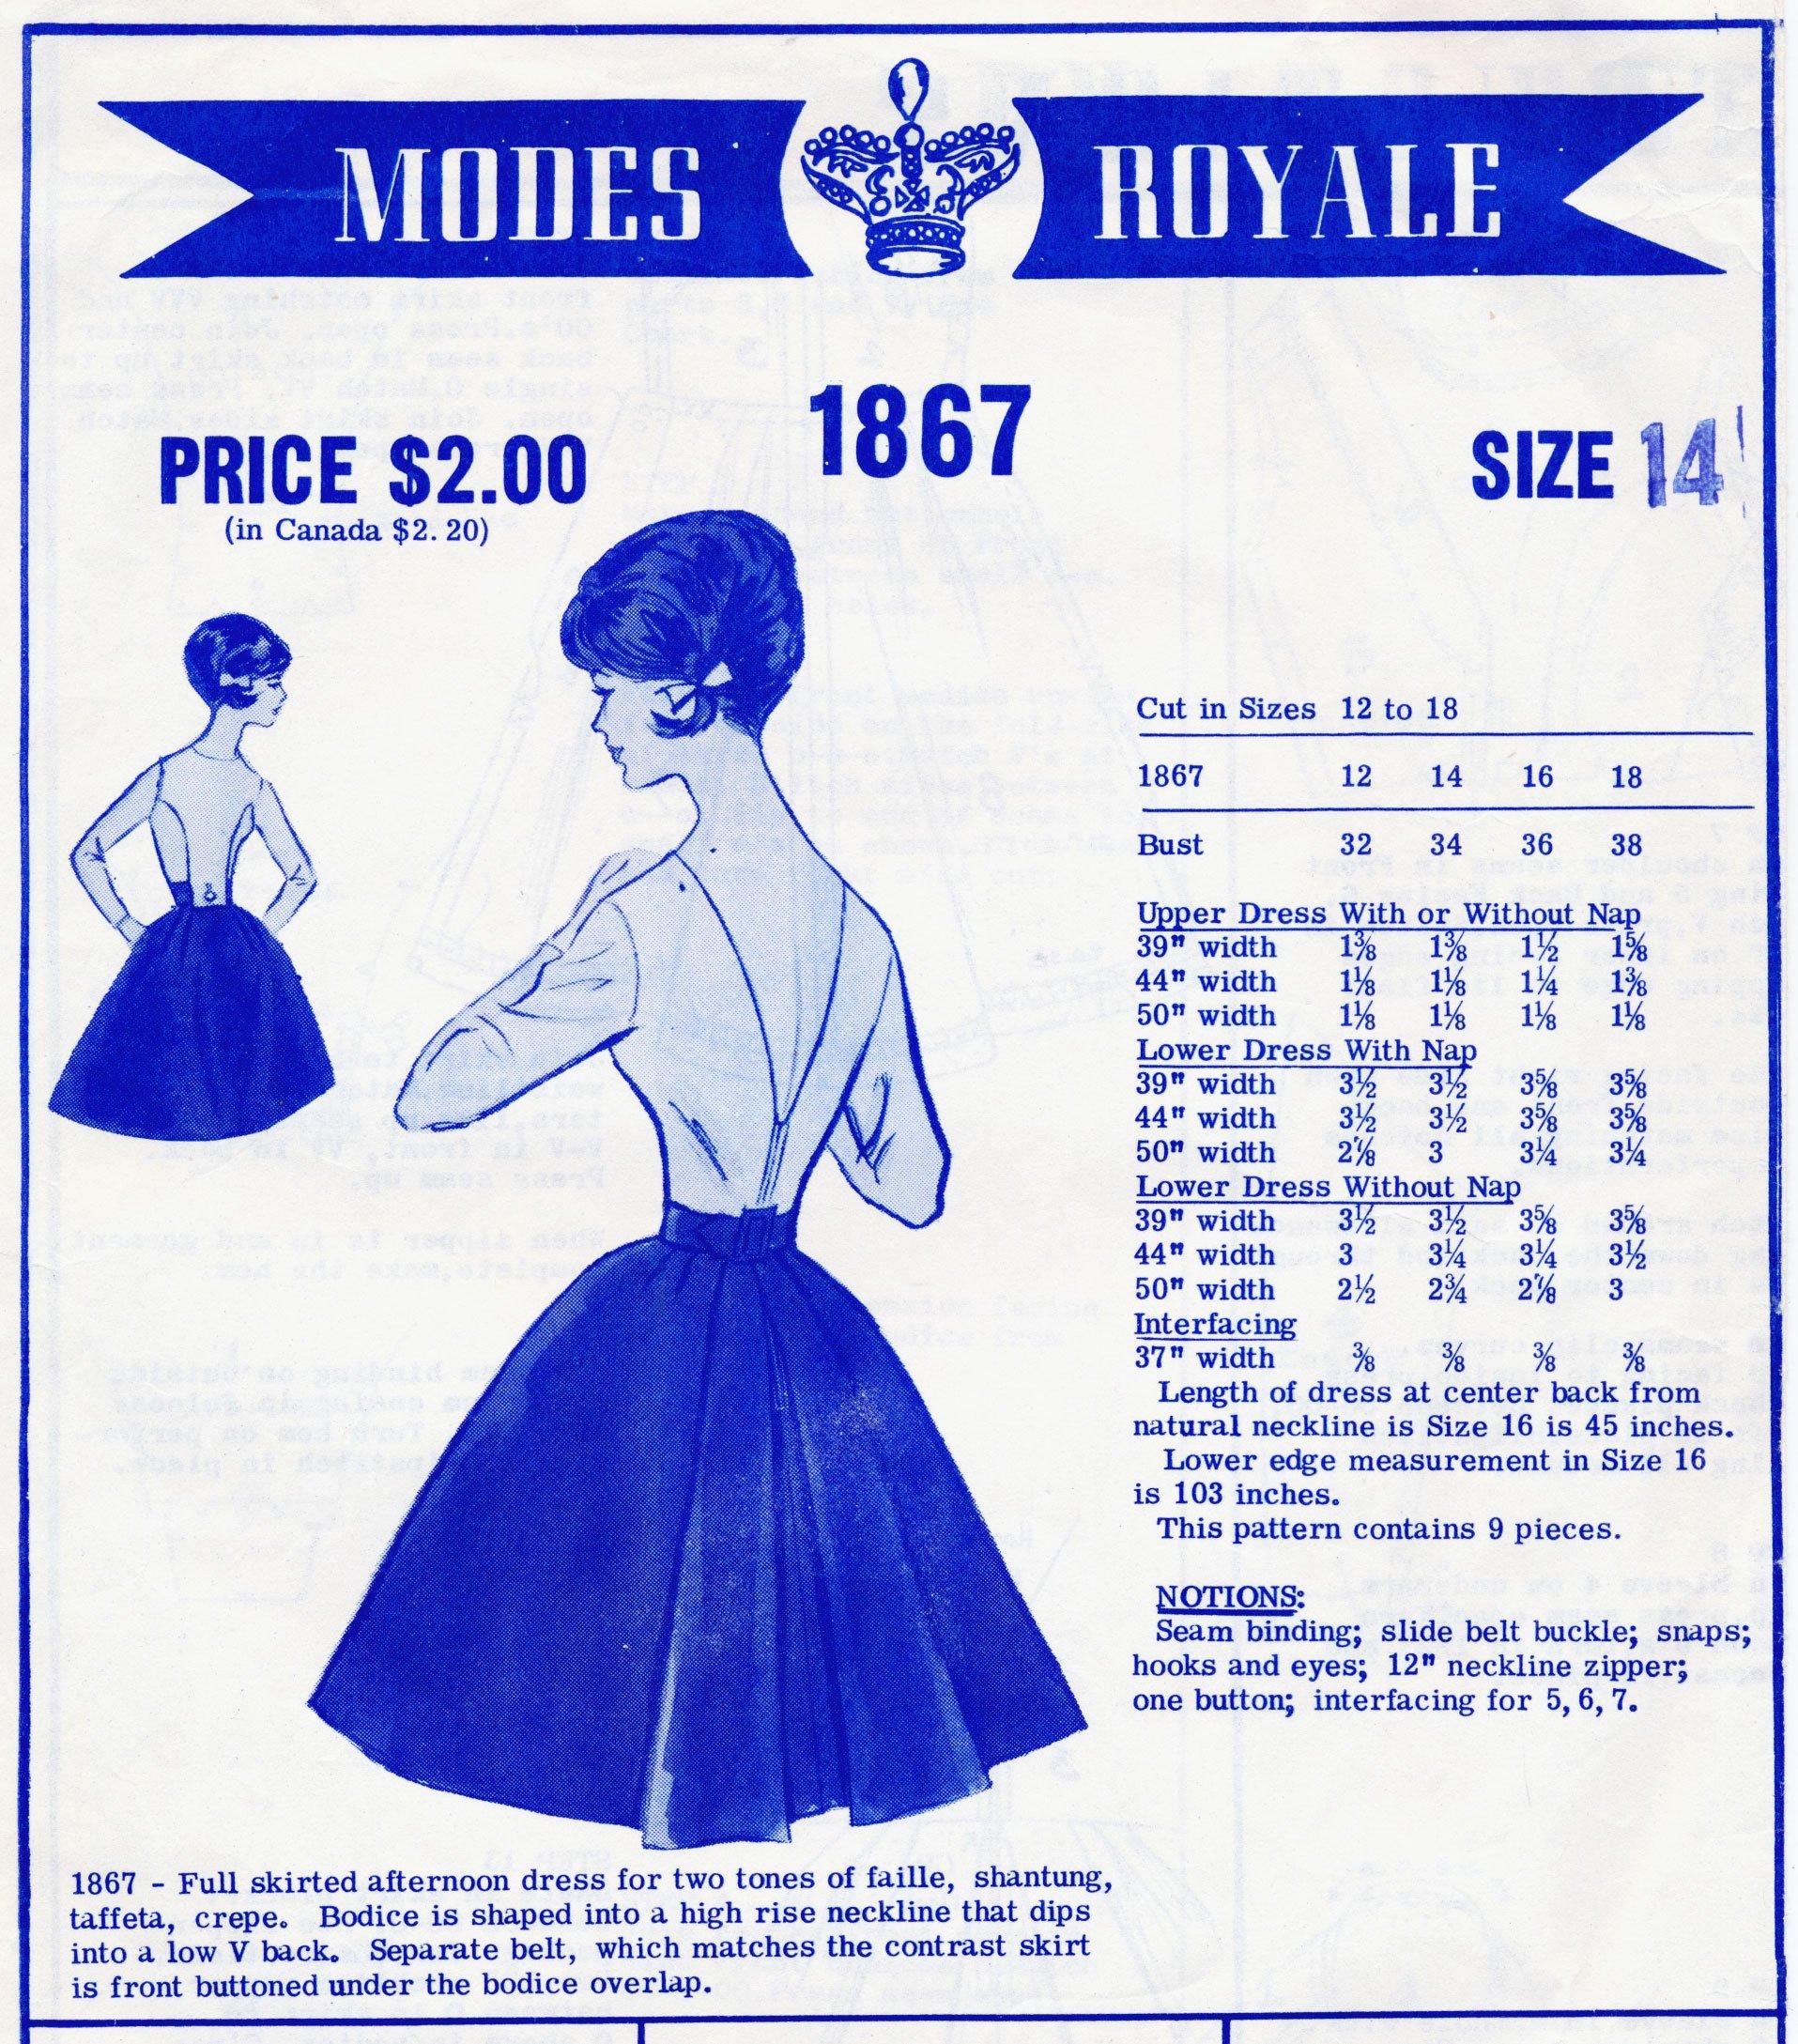 Modes Royale 1867